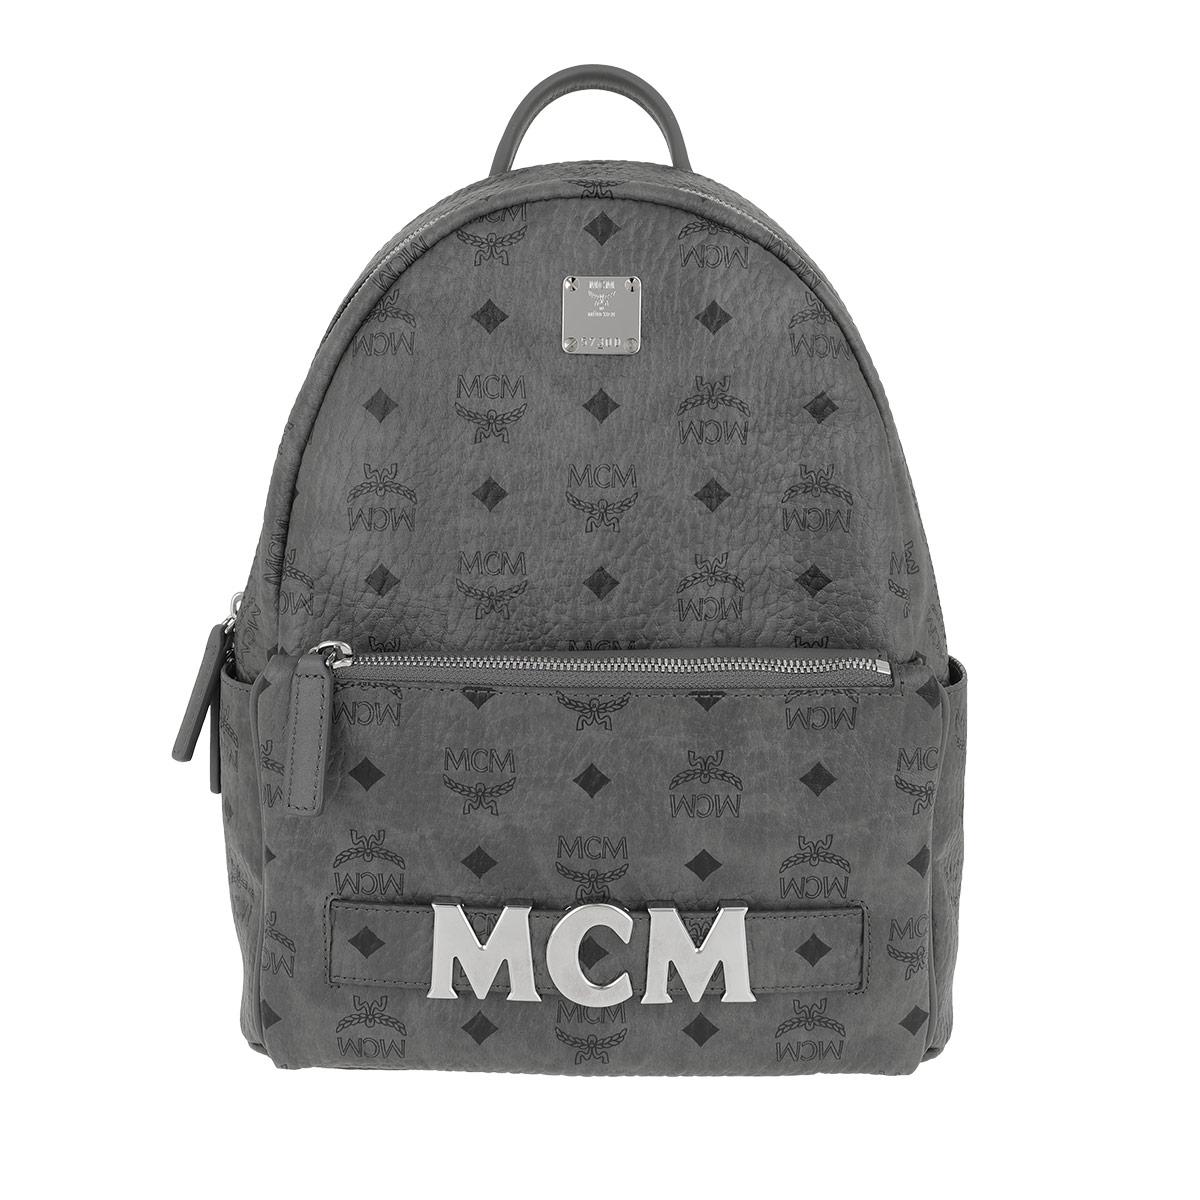 MCM Rucksack - Trio Stark Backpack Small Phantom Grey - in grau - für Damen